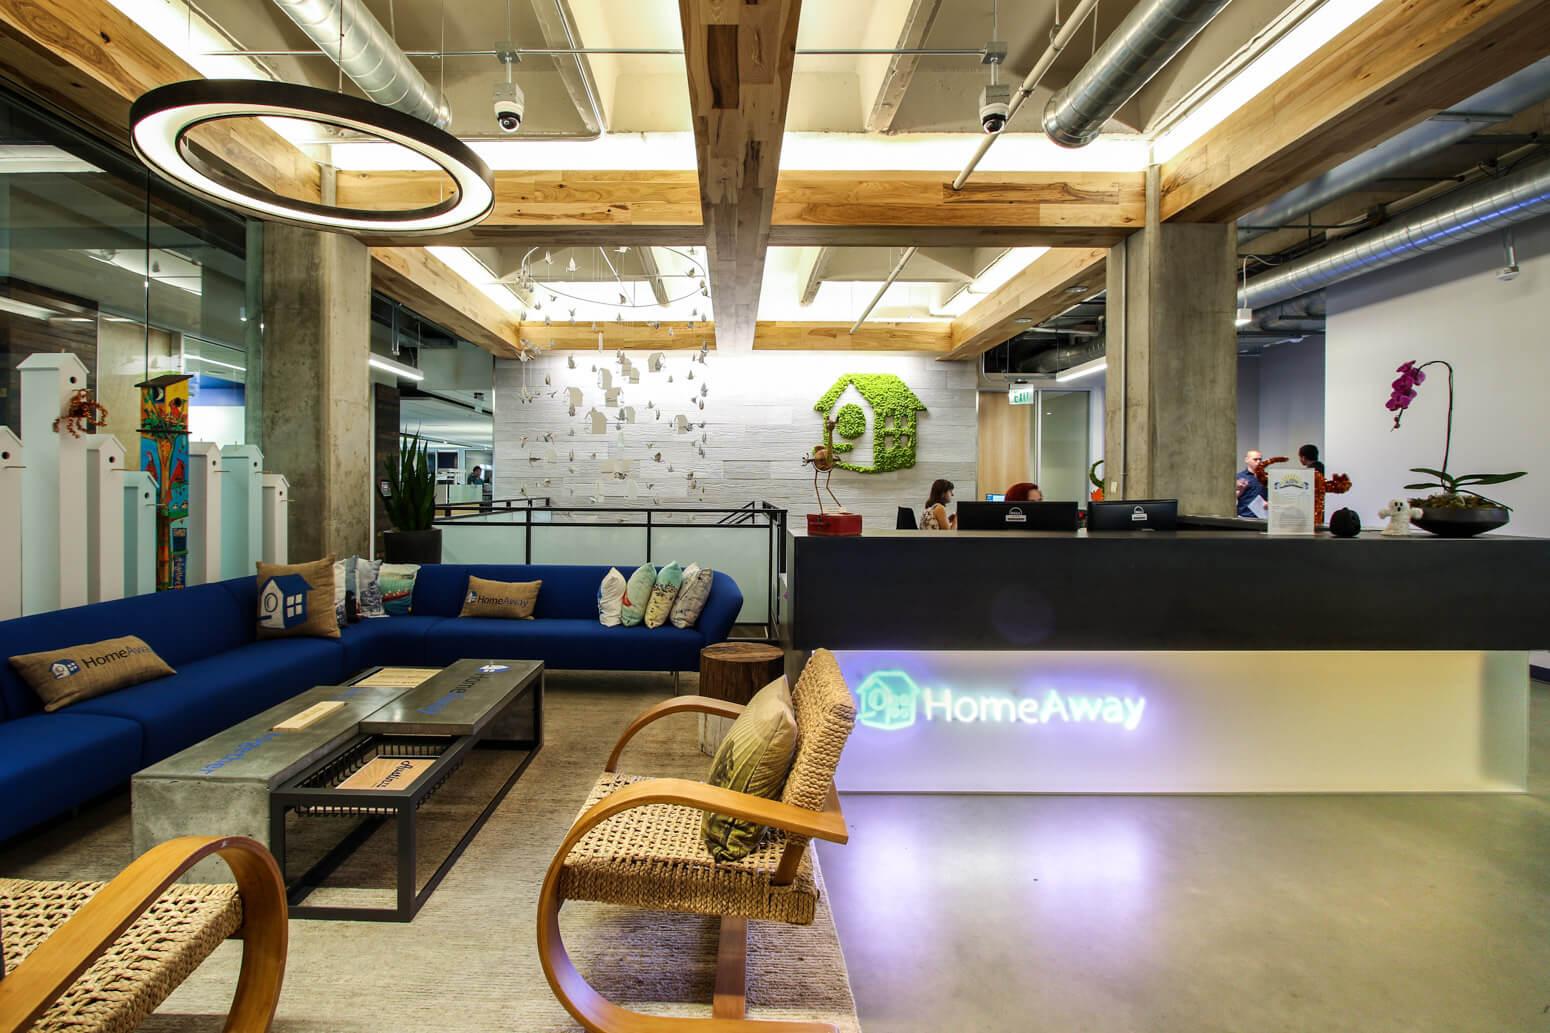 HomeAway Austin Office Killer Spaces-3